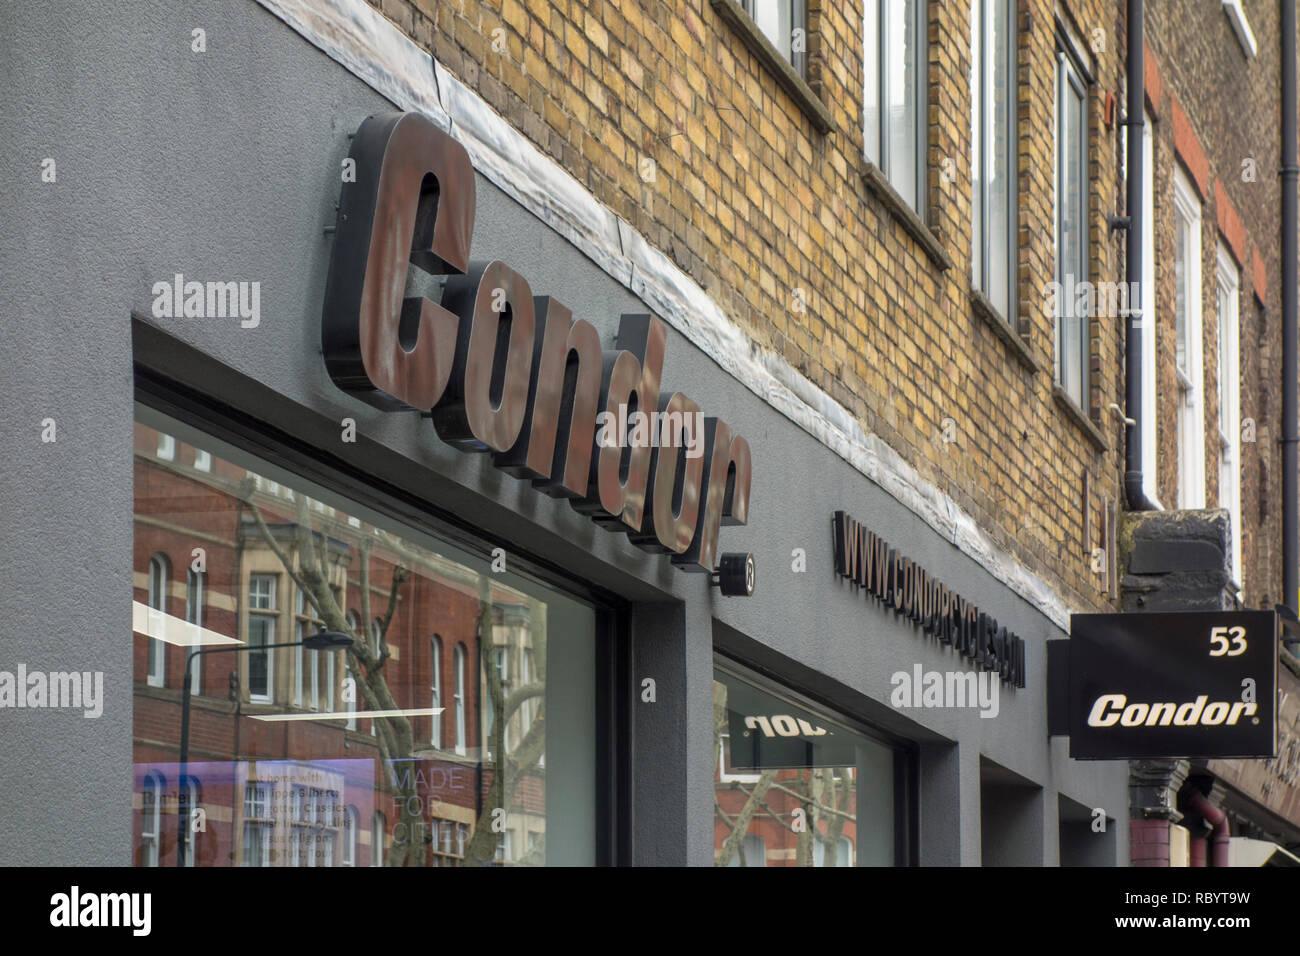 Condor bikes store in London, UK - Stock Image